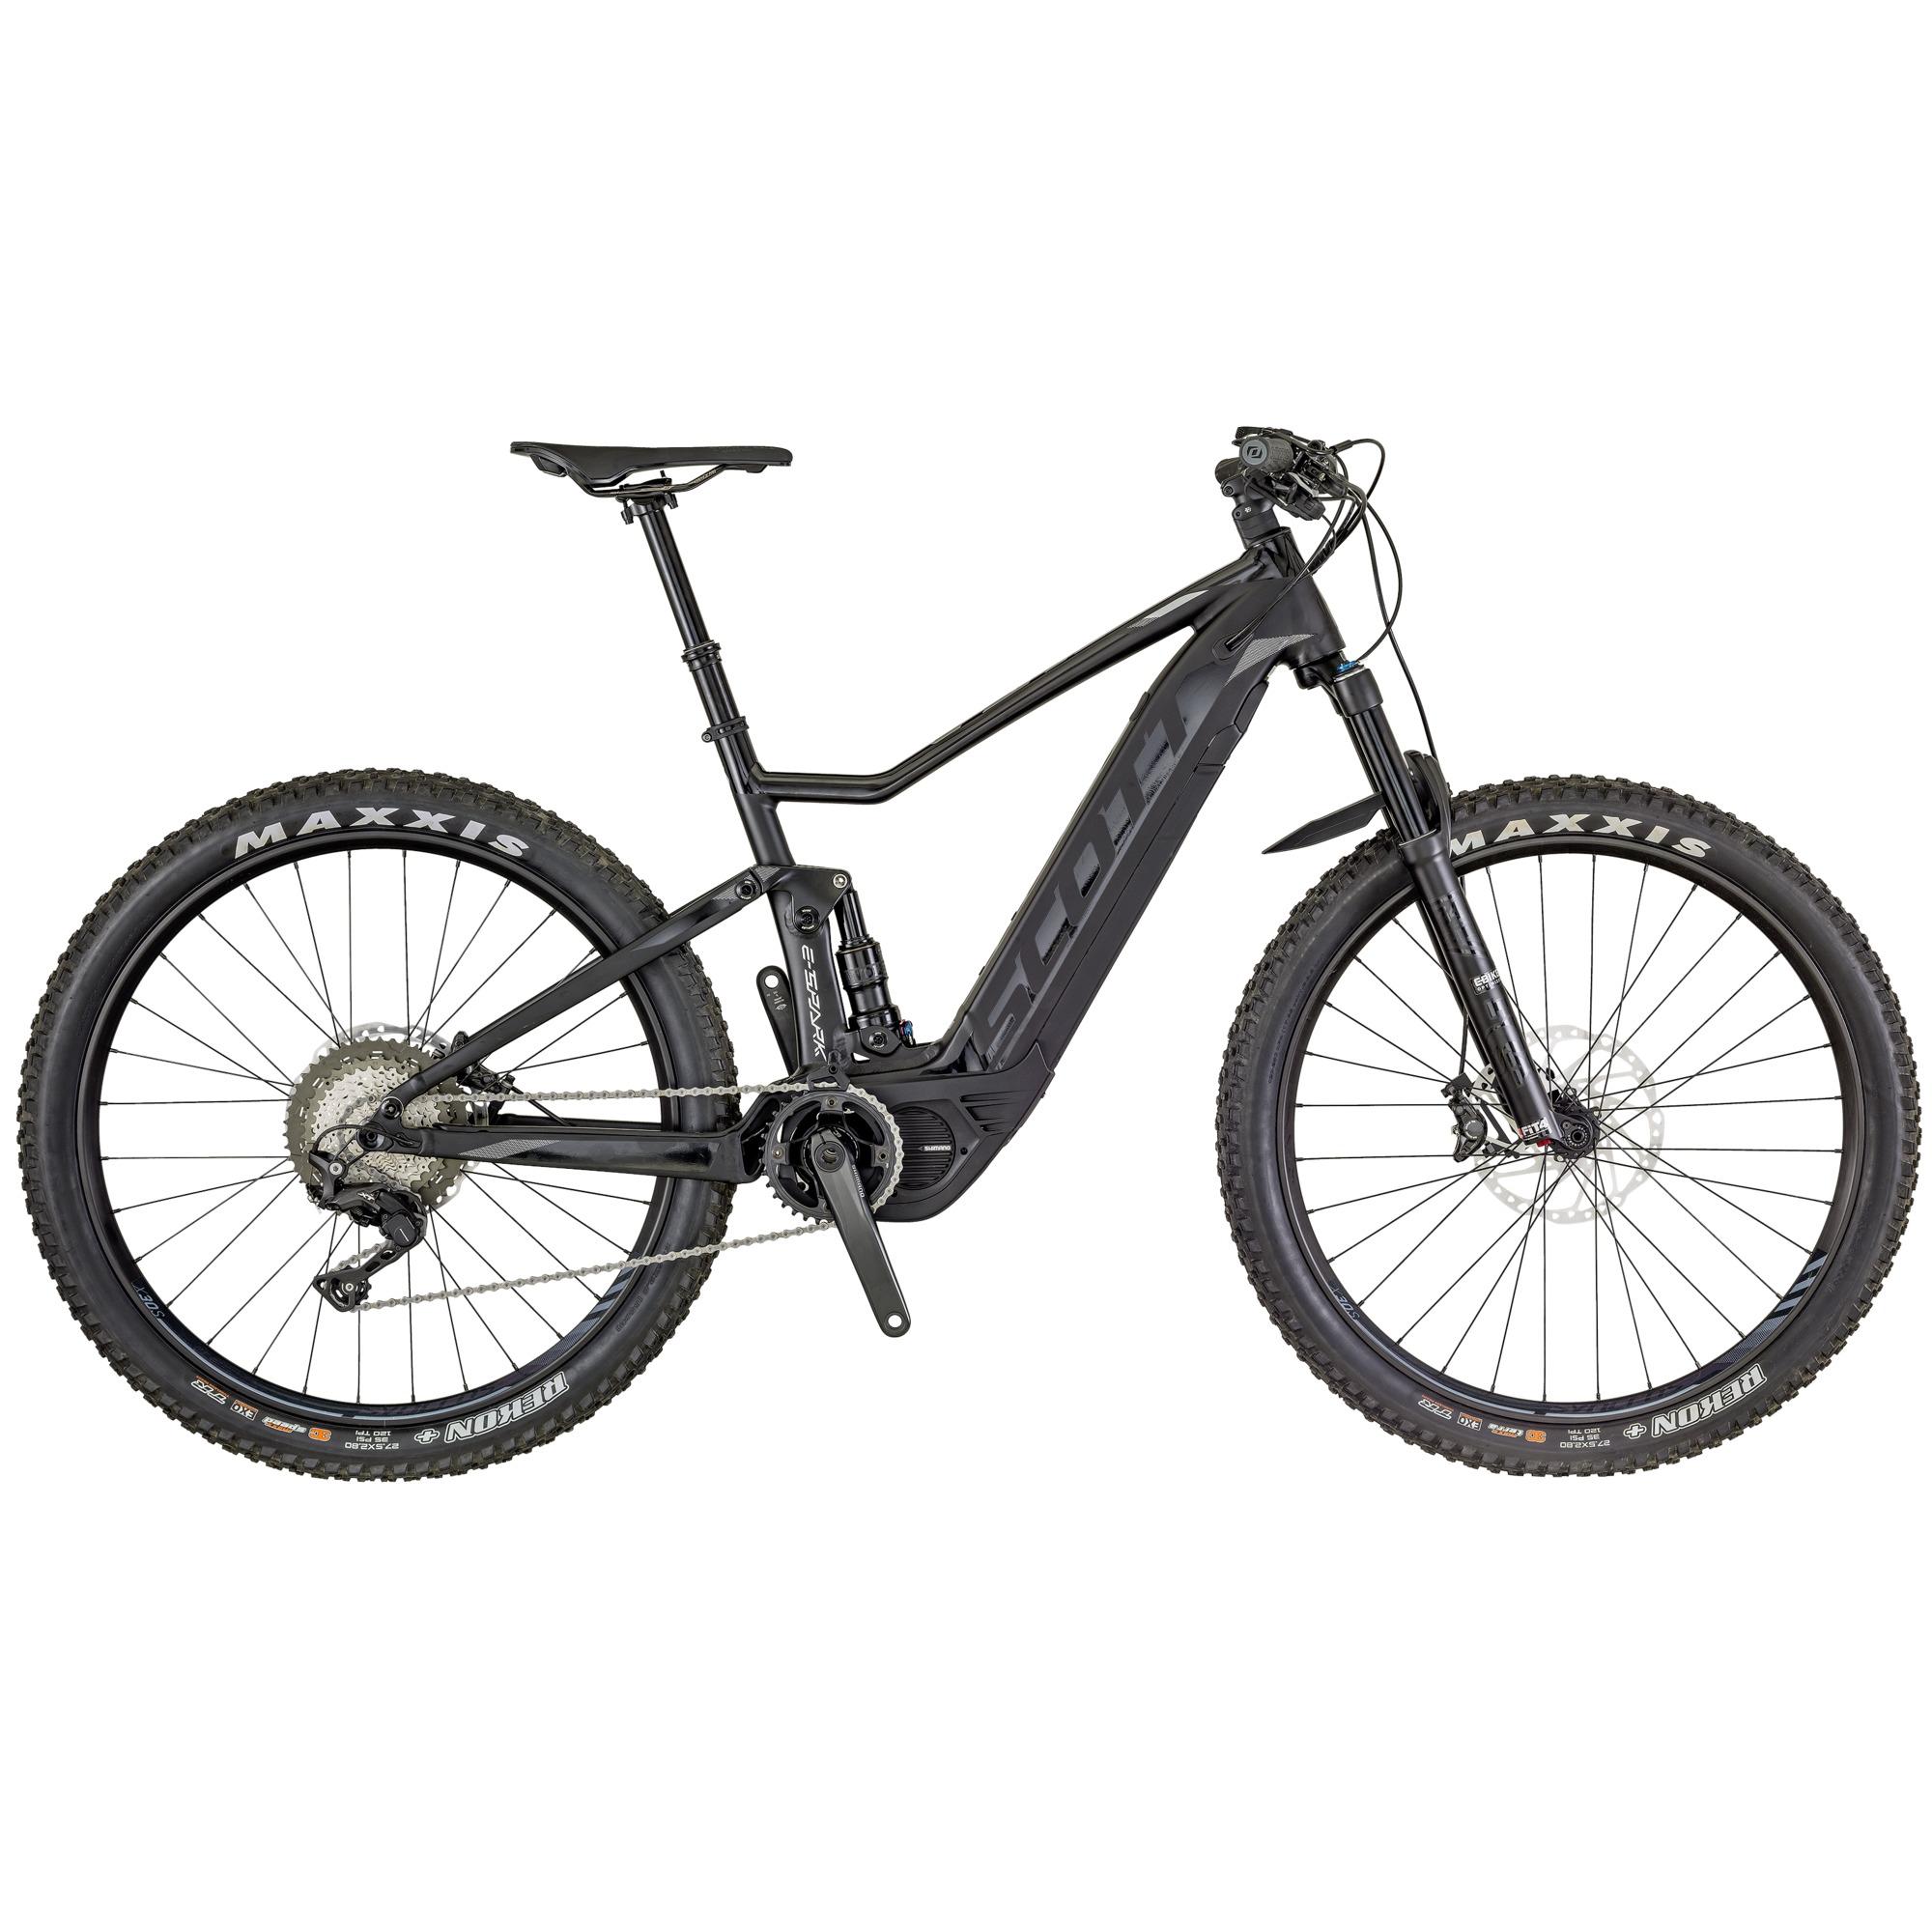 SCOTT E-Spark 710 Fahrrad L - Zweirad Homann